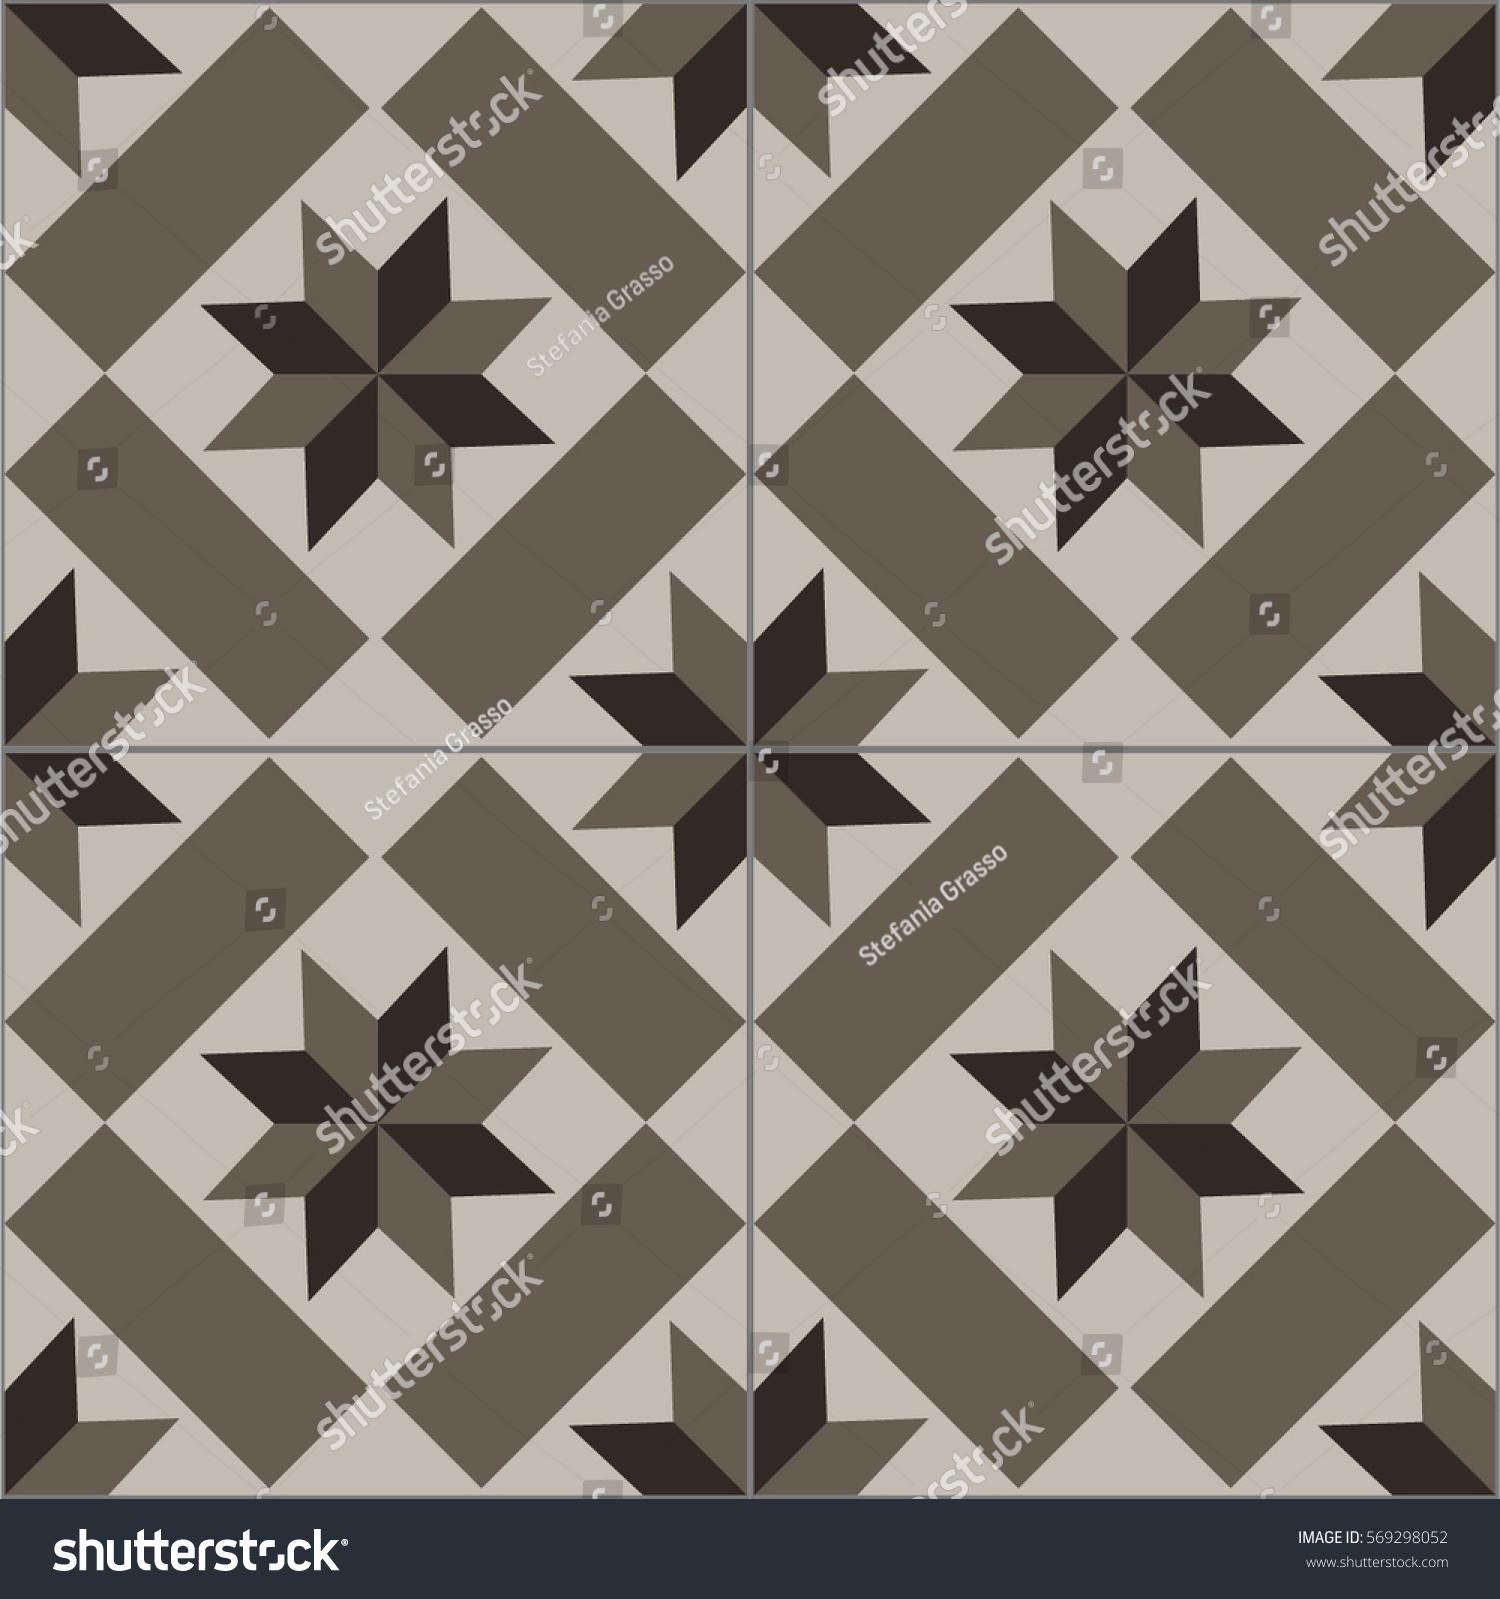 Patterned Floor Wall Tiles Modern Decor Stock Vector 569298052 ...